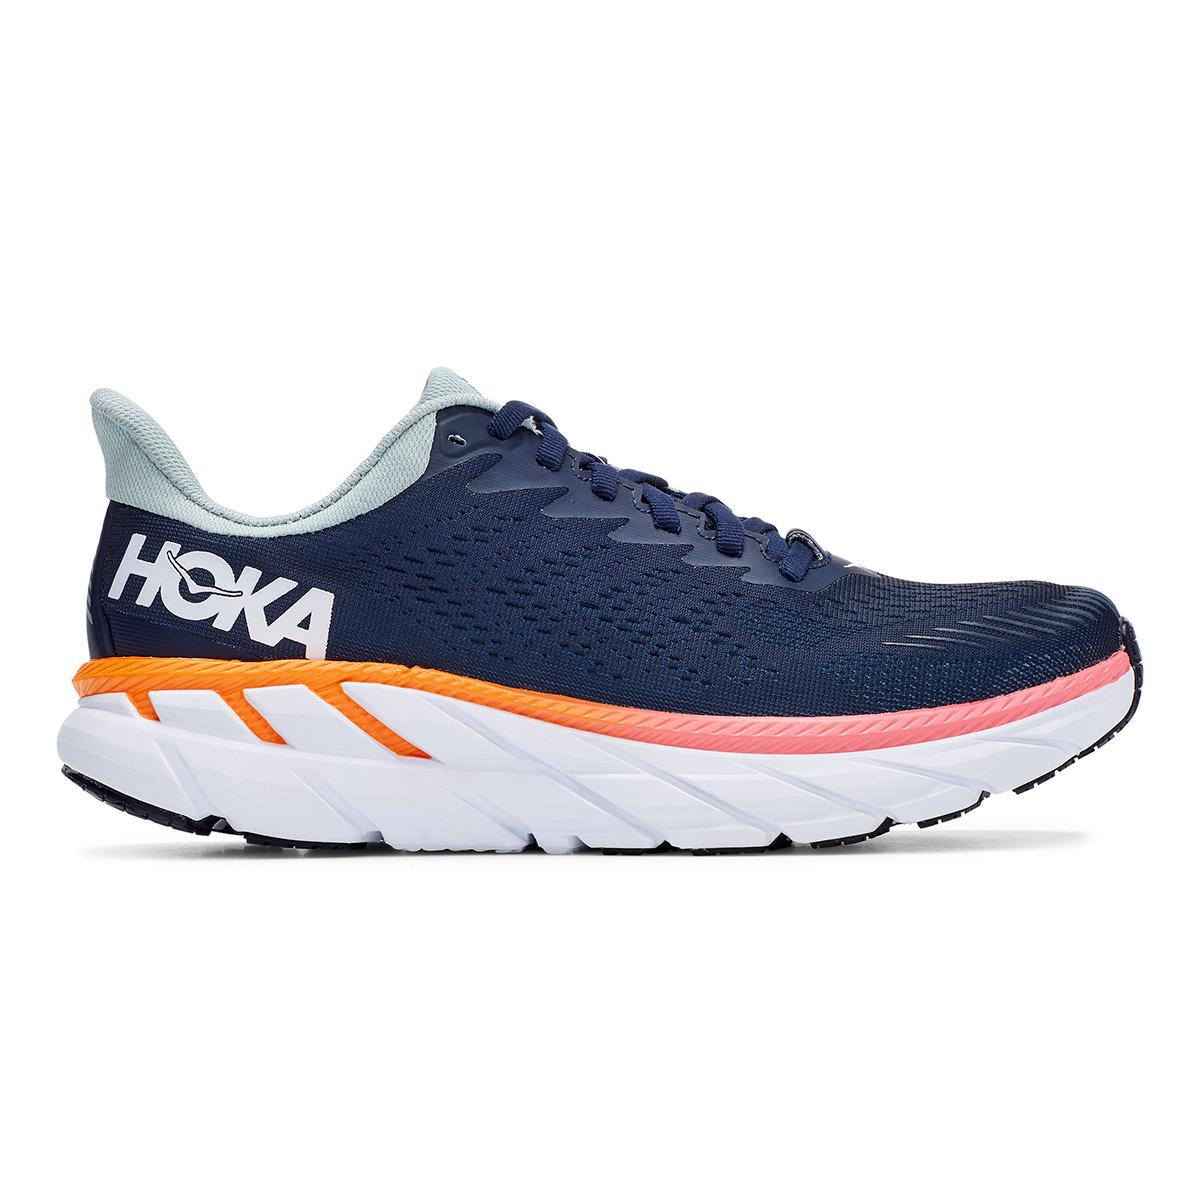 Women's Hoka One One Clifton 7 Running Shoe - Color: Black Iris/Blue Haze - Size: 6 - Width: Regular, Black Iris/Blue Haze, large, image 1